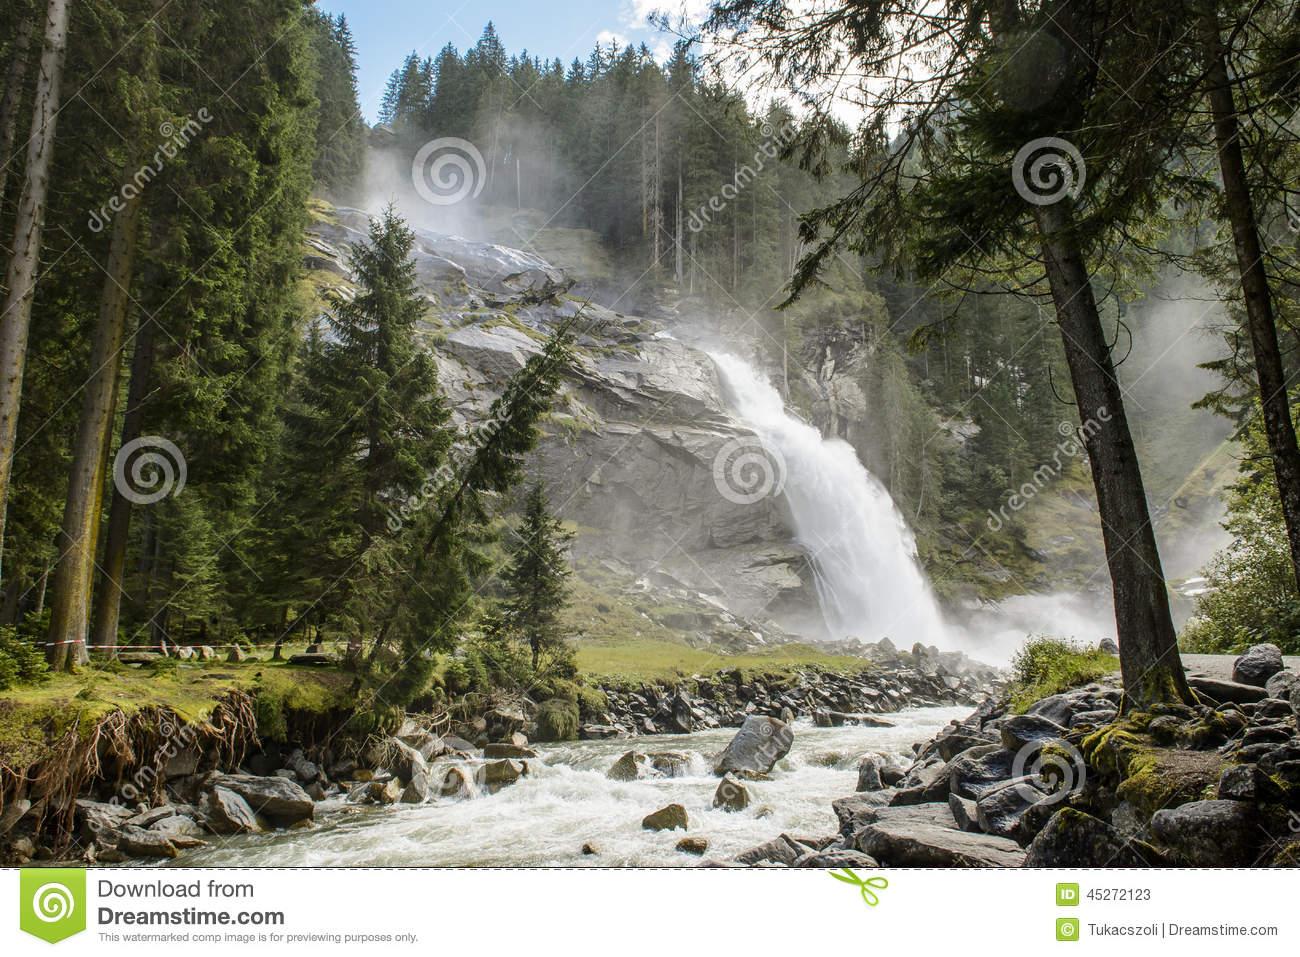 Krimml Waterfalls clipart #11, Download drawings